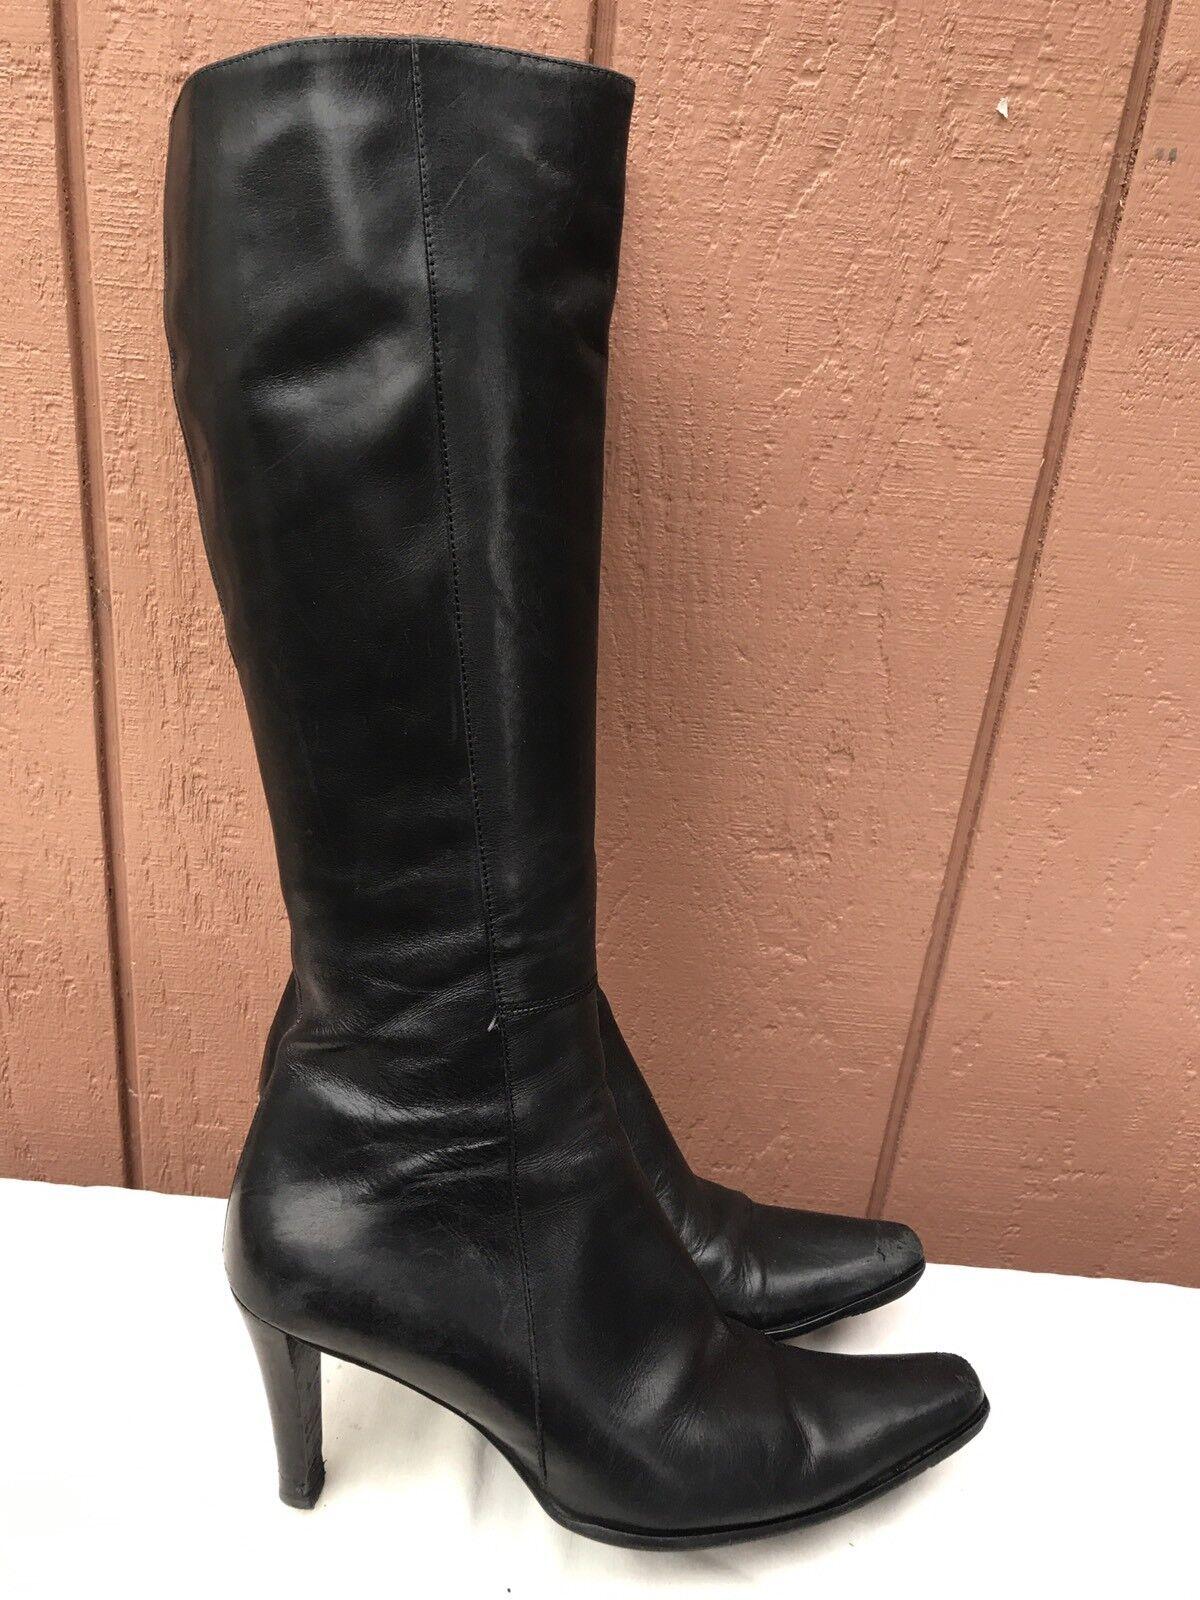 Wouomo L K Bennett Knee High nero Soft Leather stivali Dimensione 39.5 US 8.5